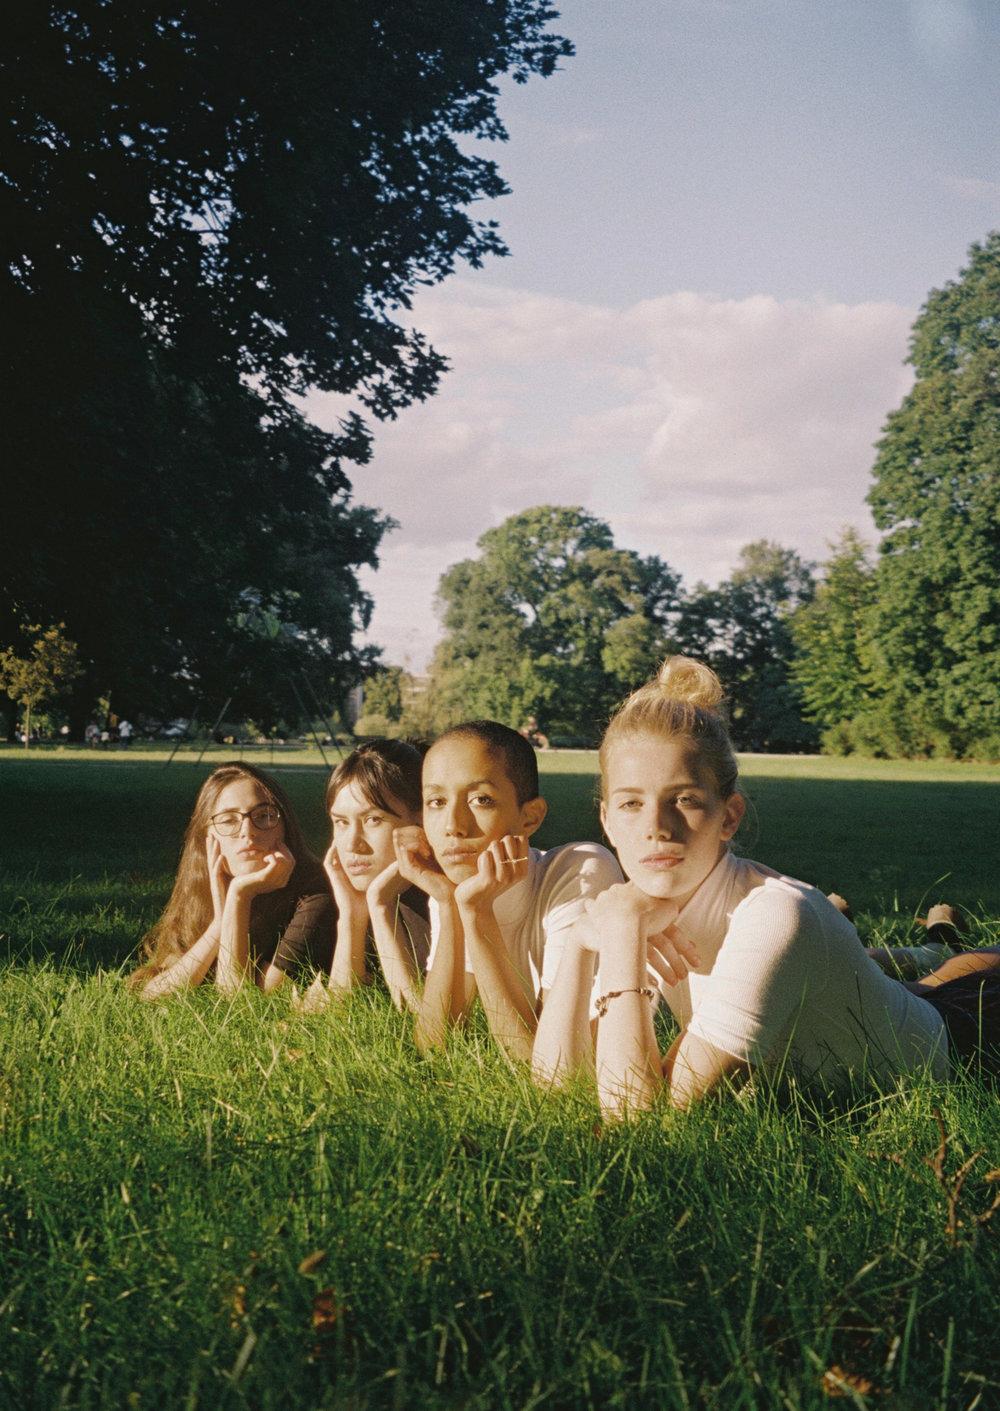 #ophelieandthegirls by Ophelie Rondeau 05.jpg